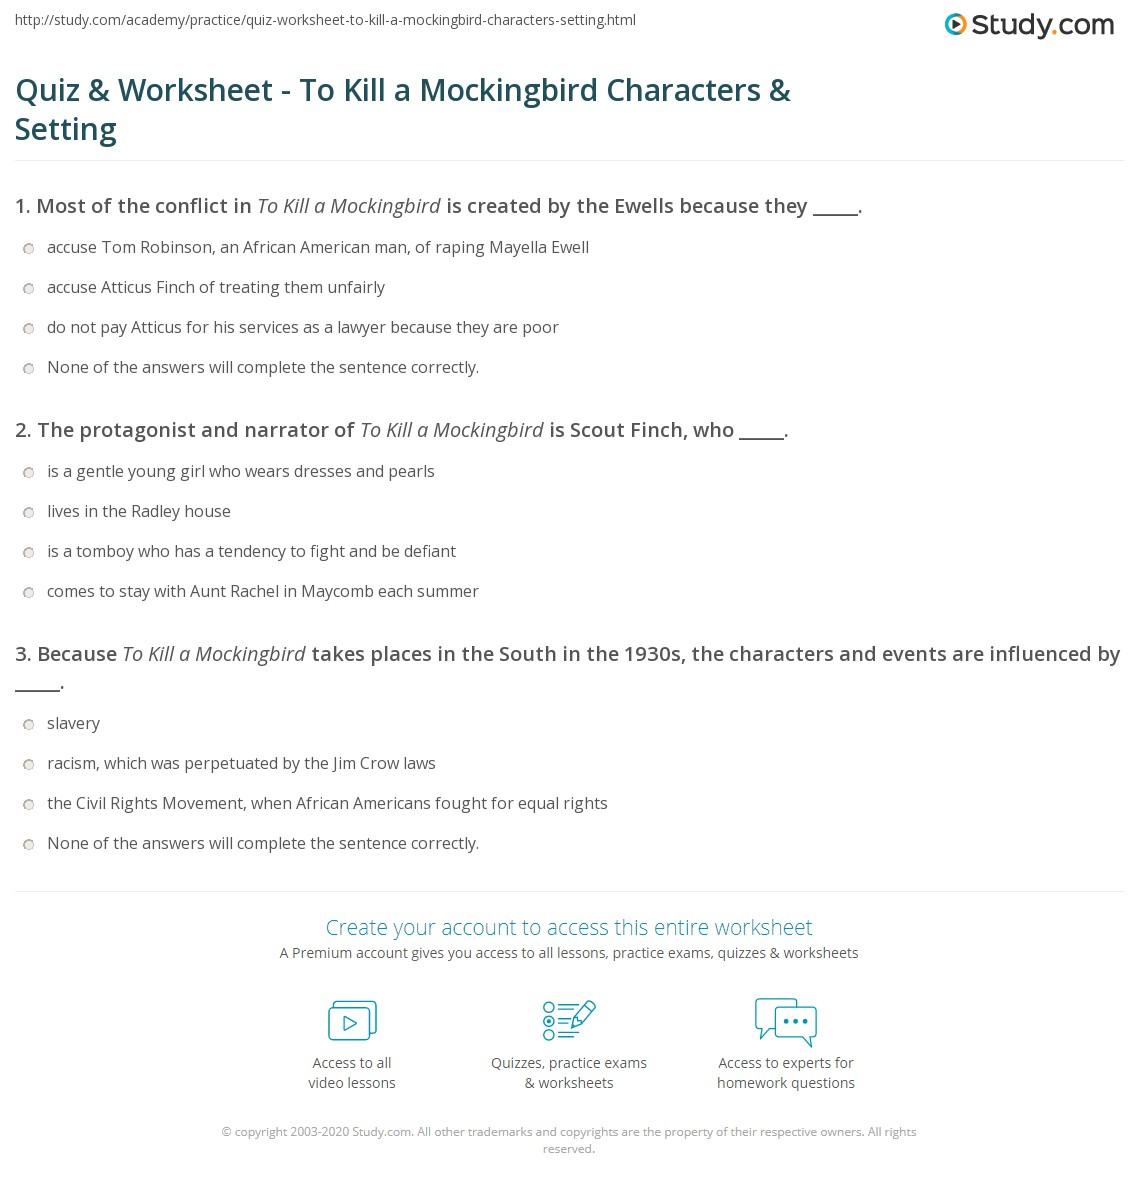 To Kill A Mockingbird Character Chart Worksheet Answers